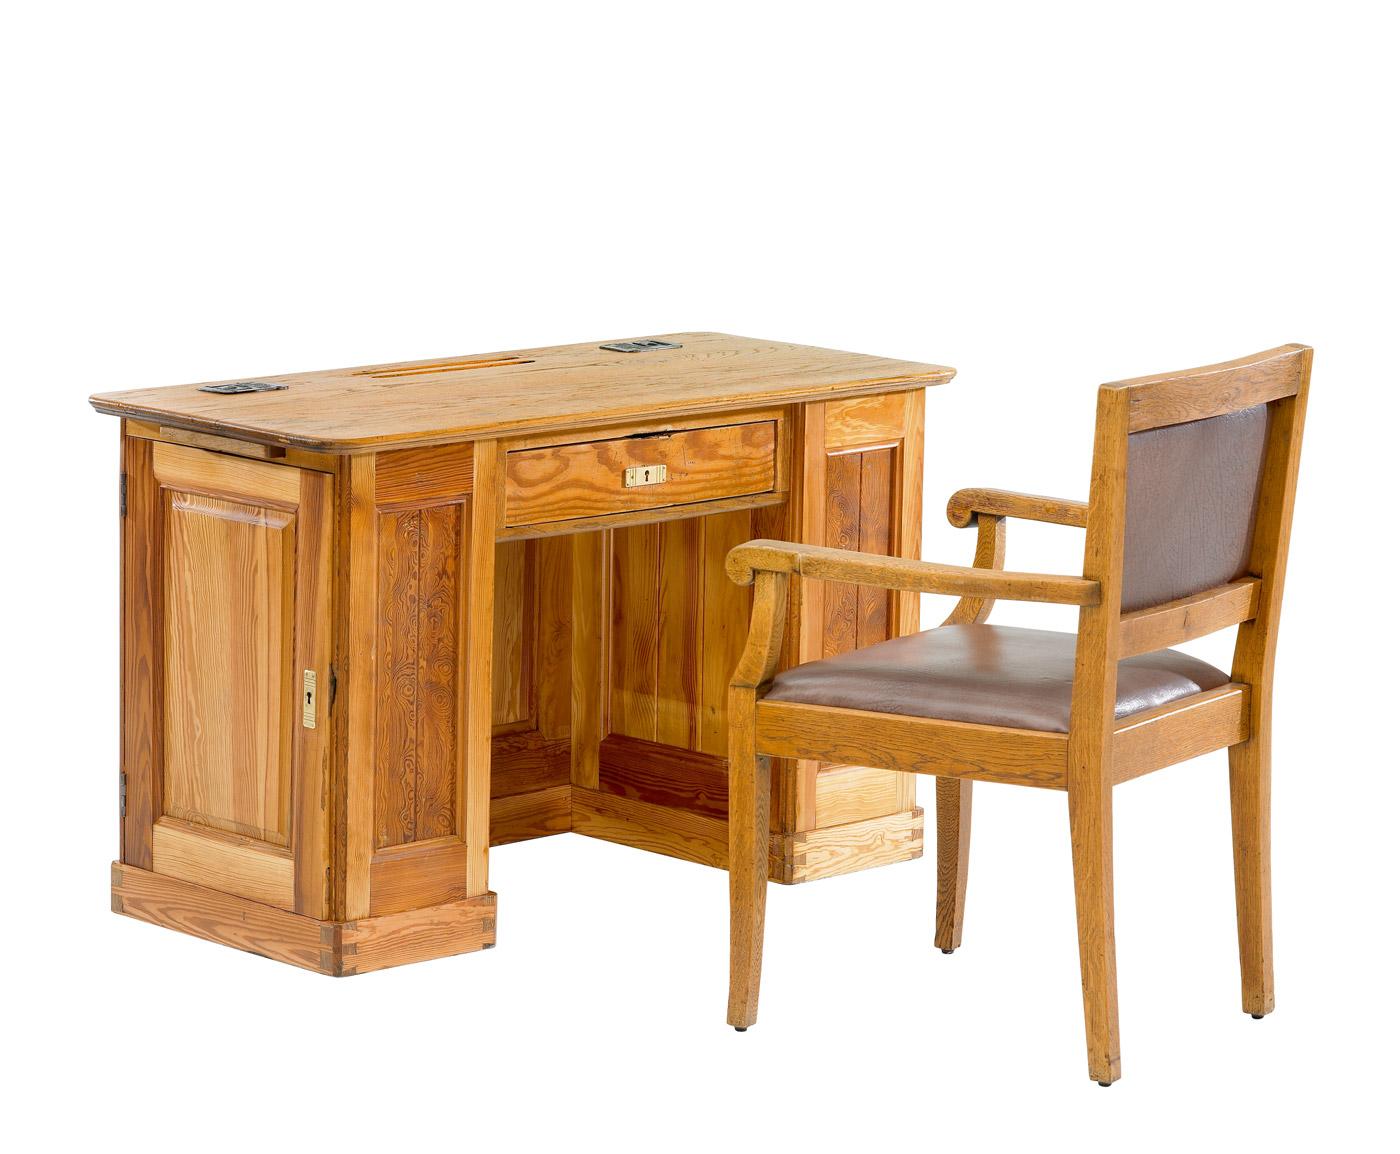 Vs the school museum historic school furniture for Table vs desk